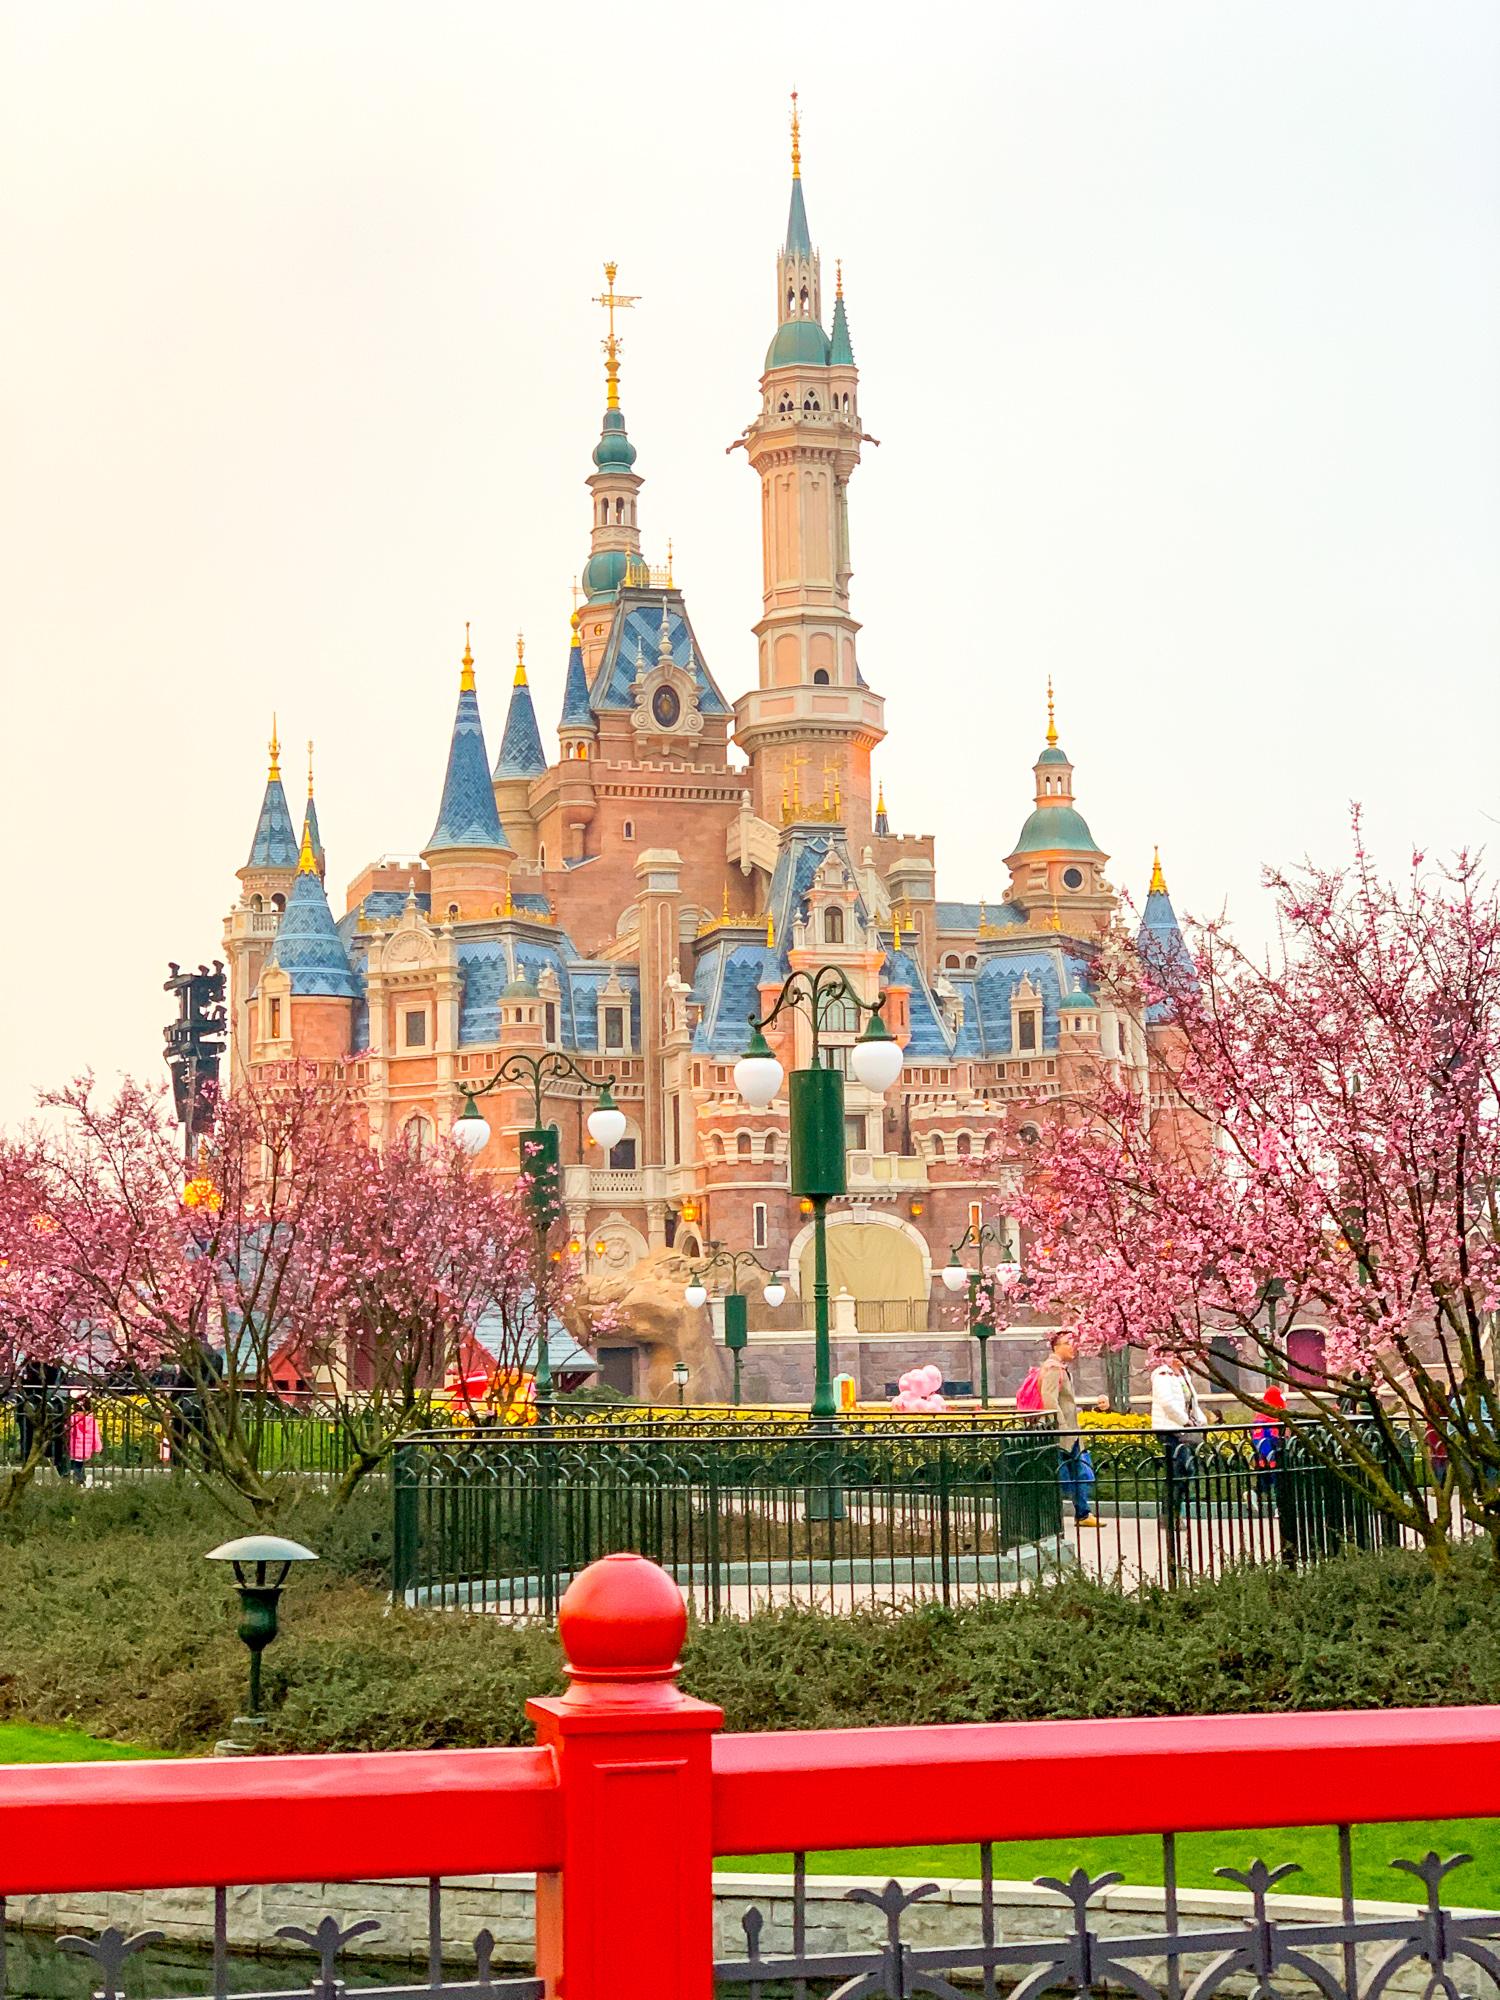 Enchanted Storybook Castle at Shanghai Disneyland